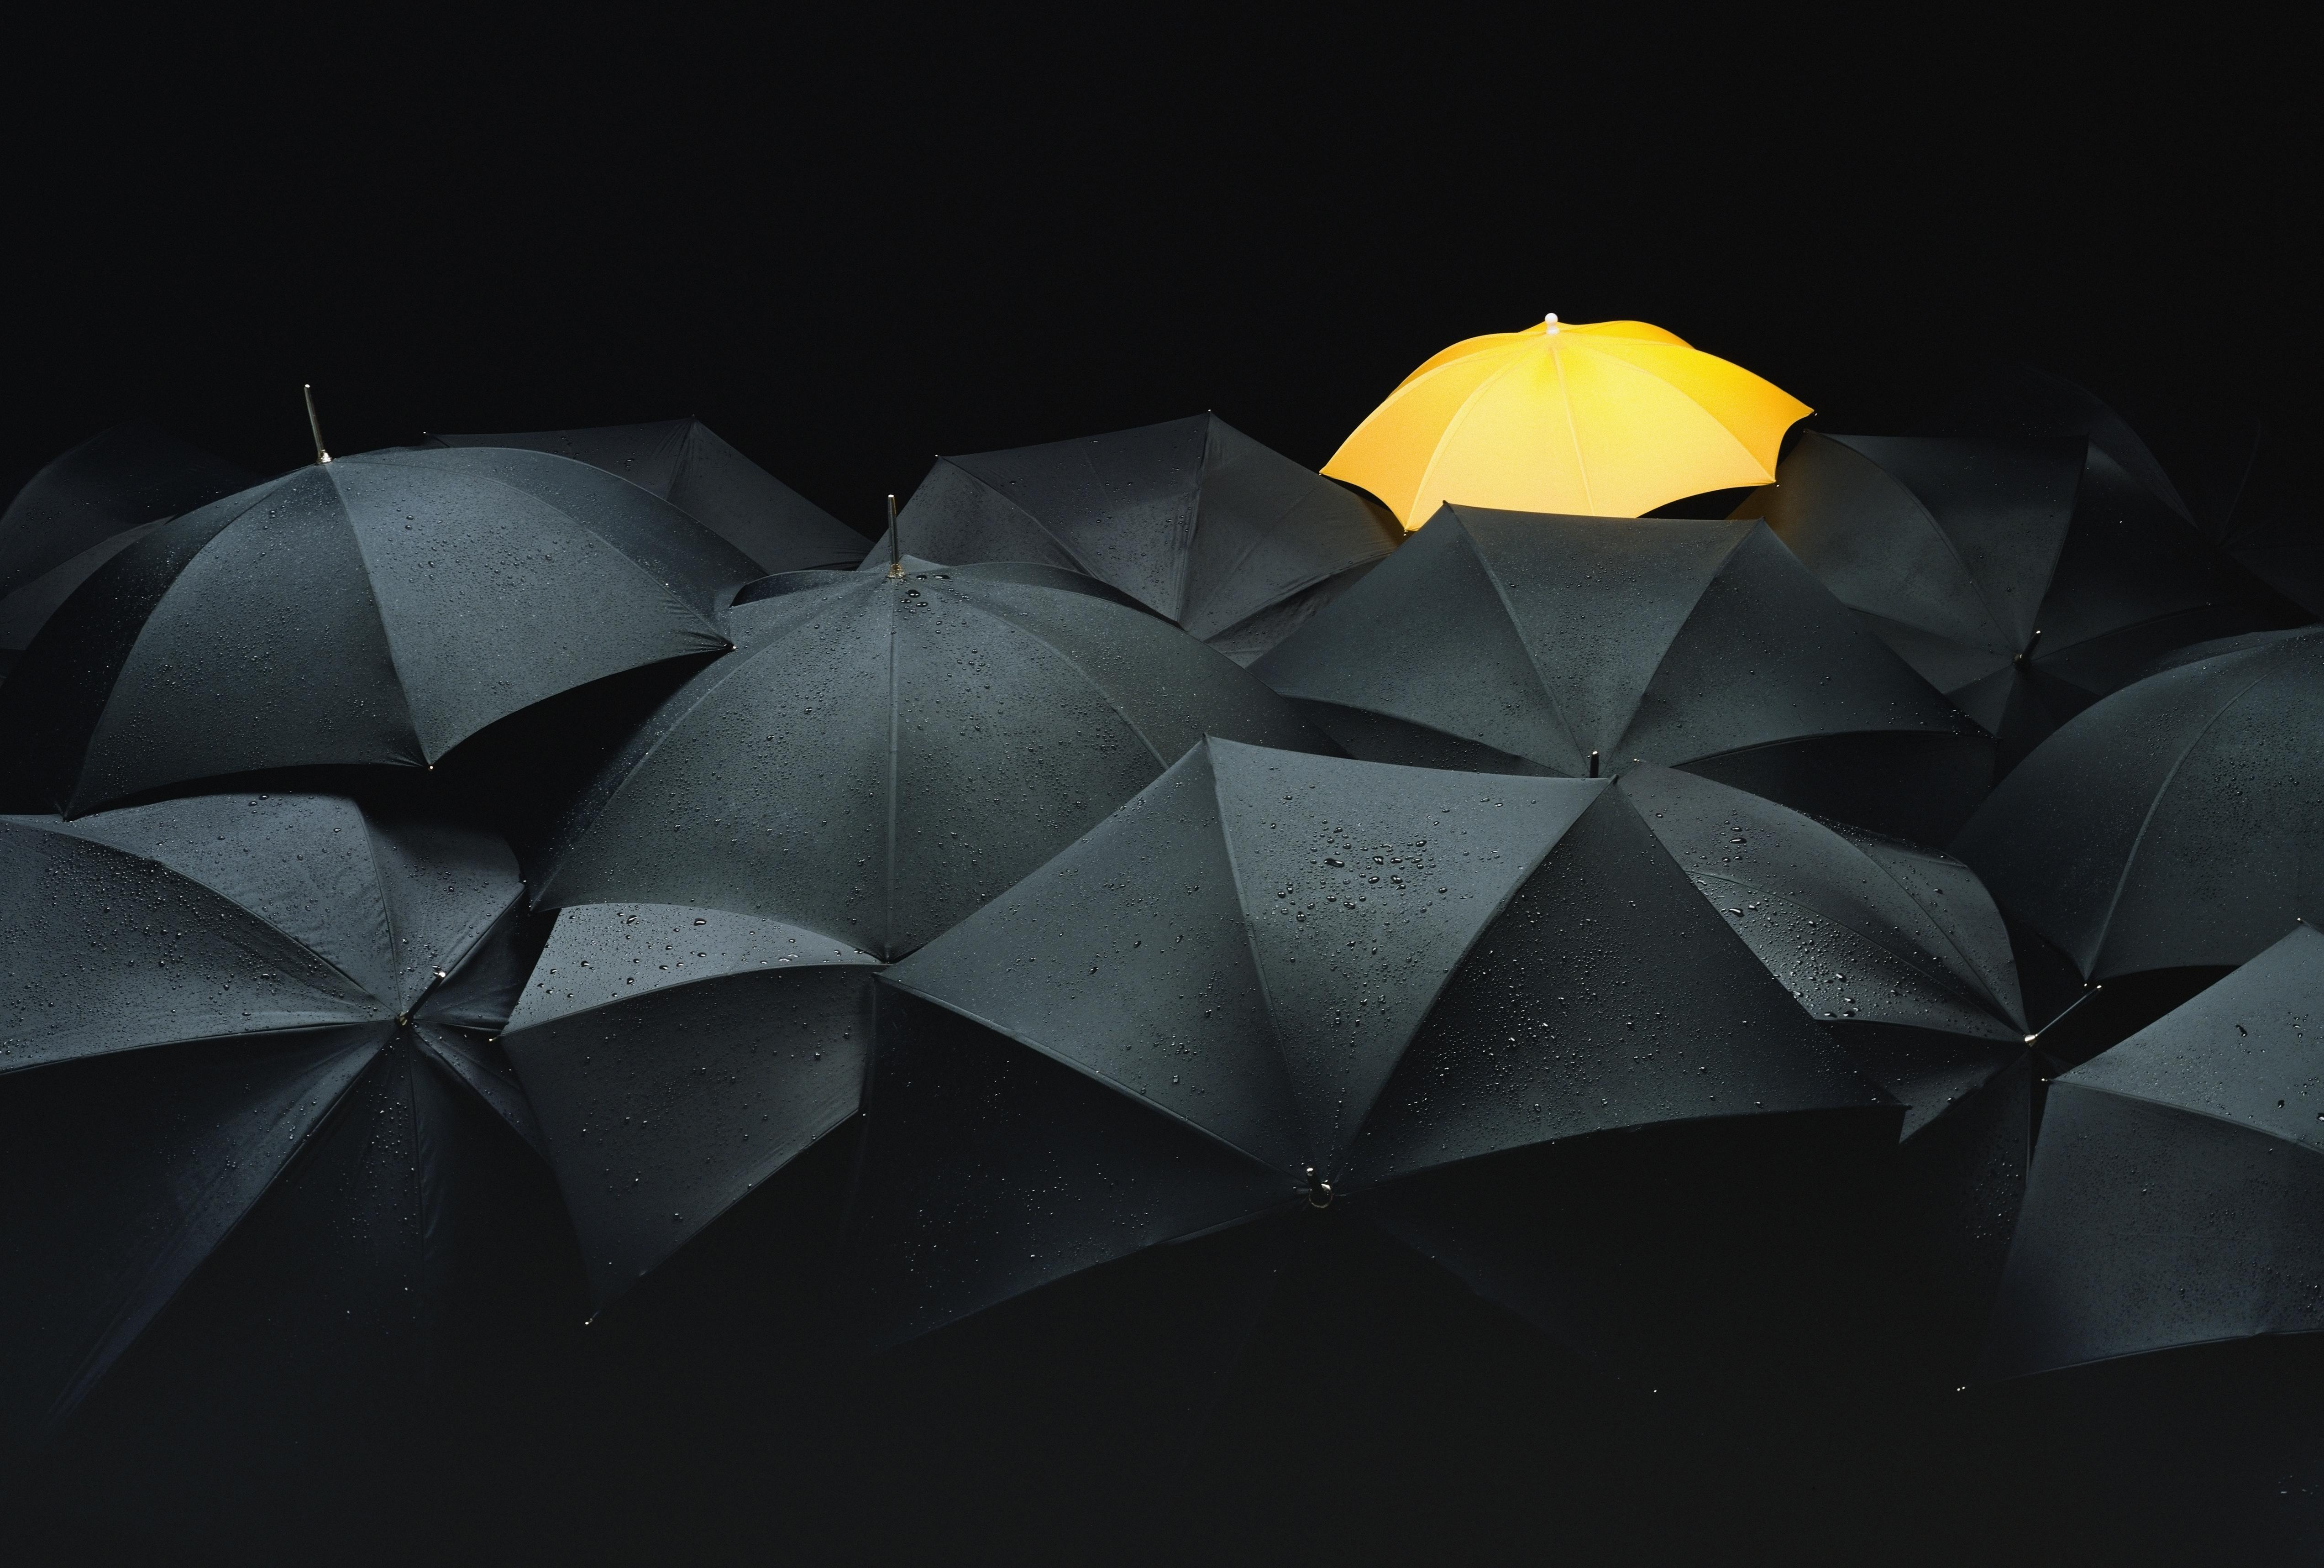 One yellow umbrella among many black umbrellas.